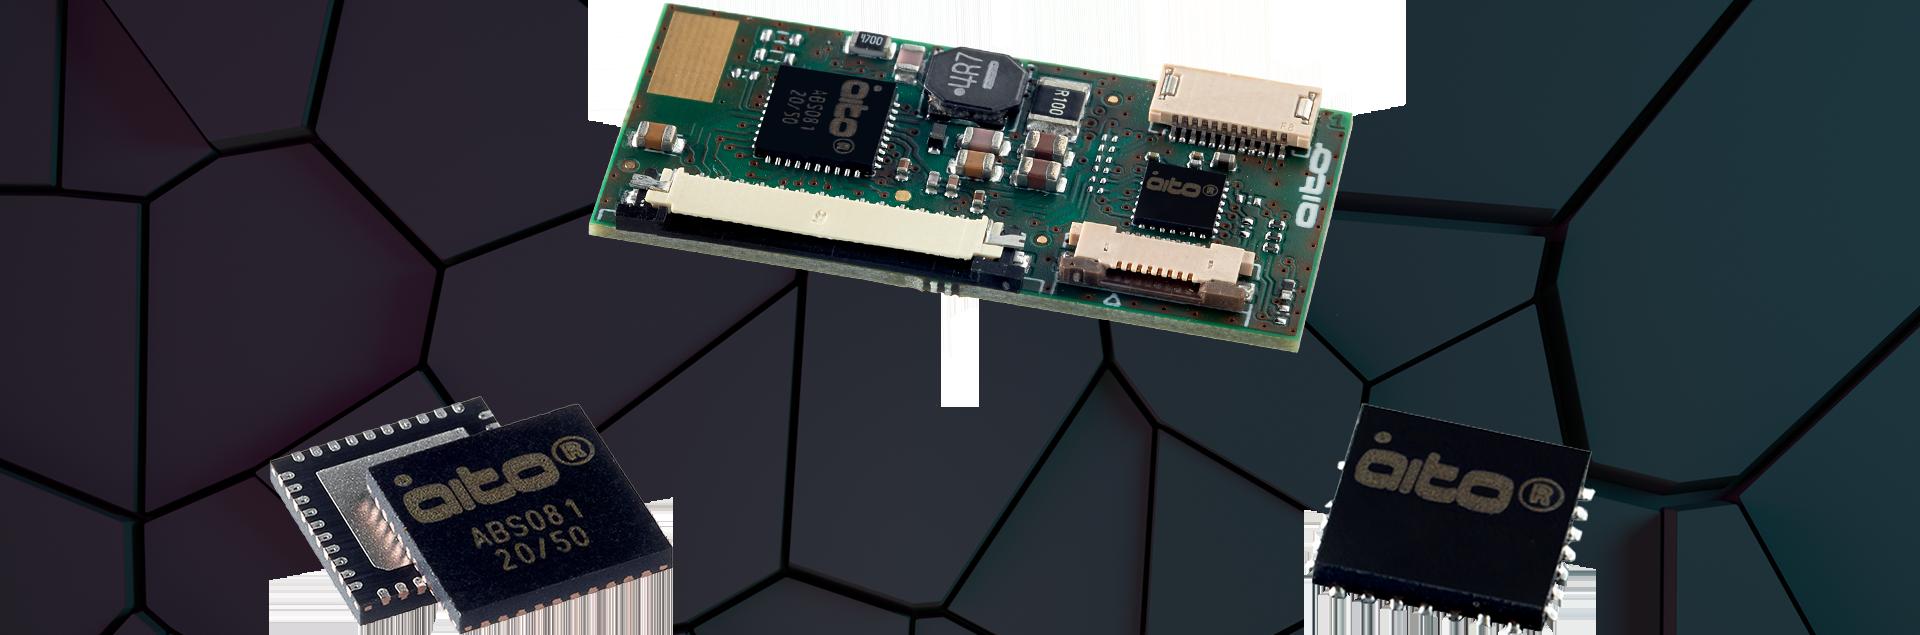 Integrated module